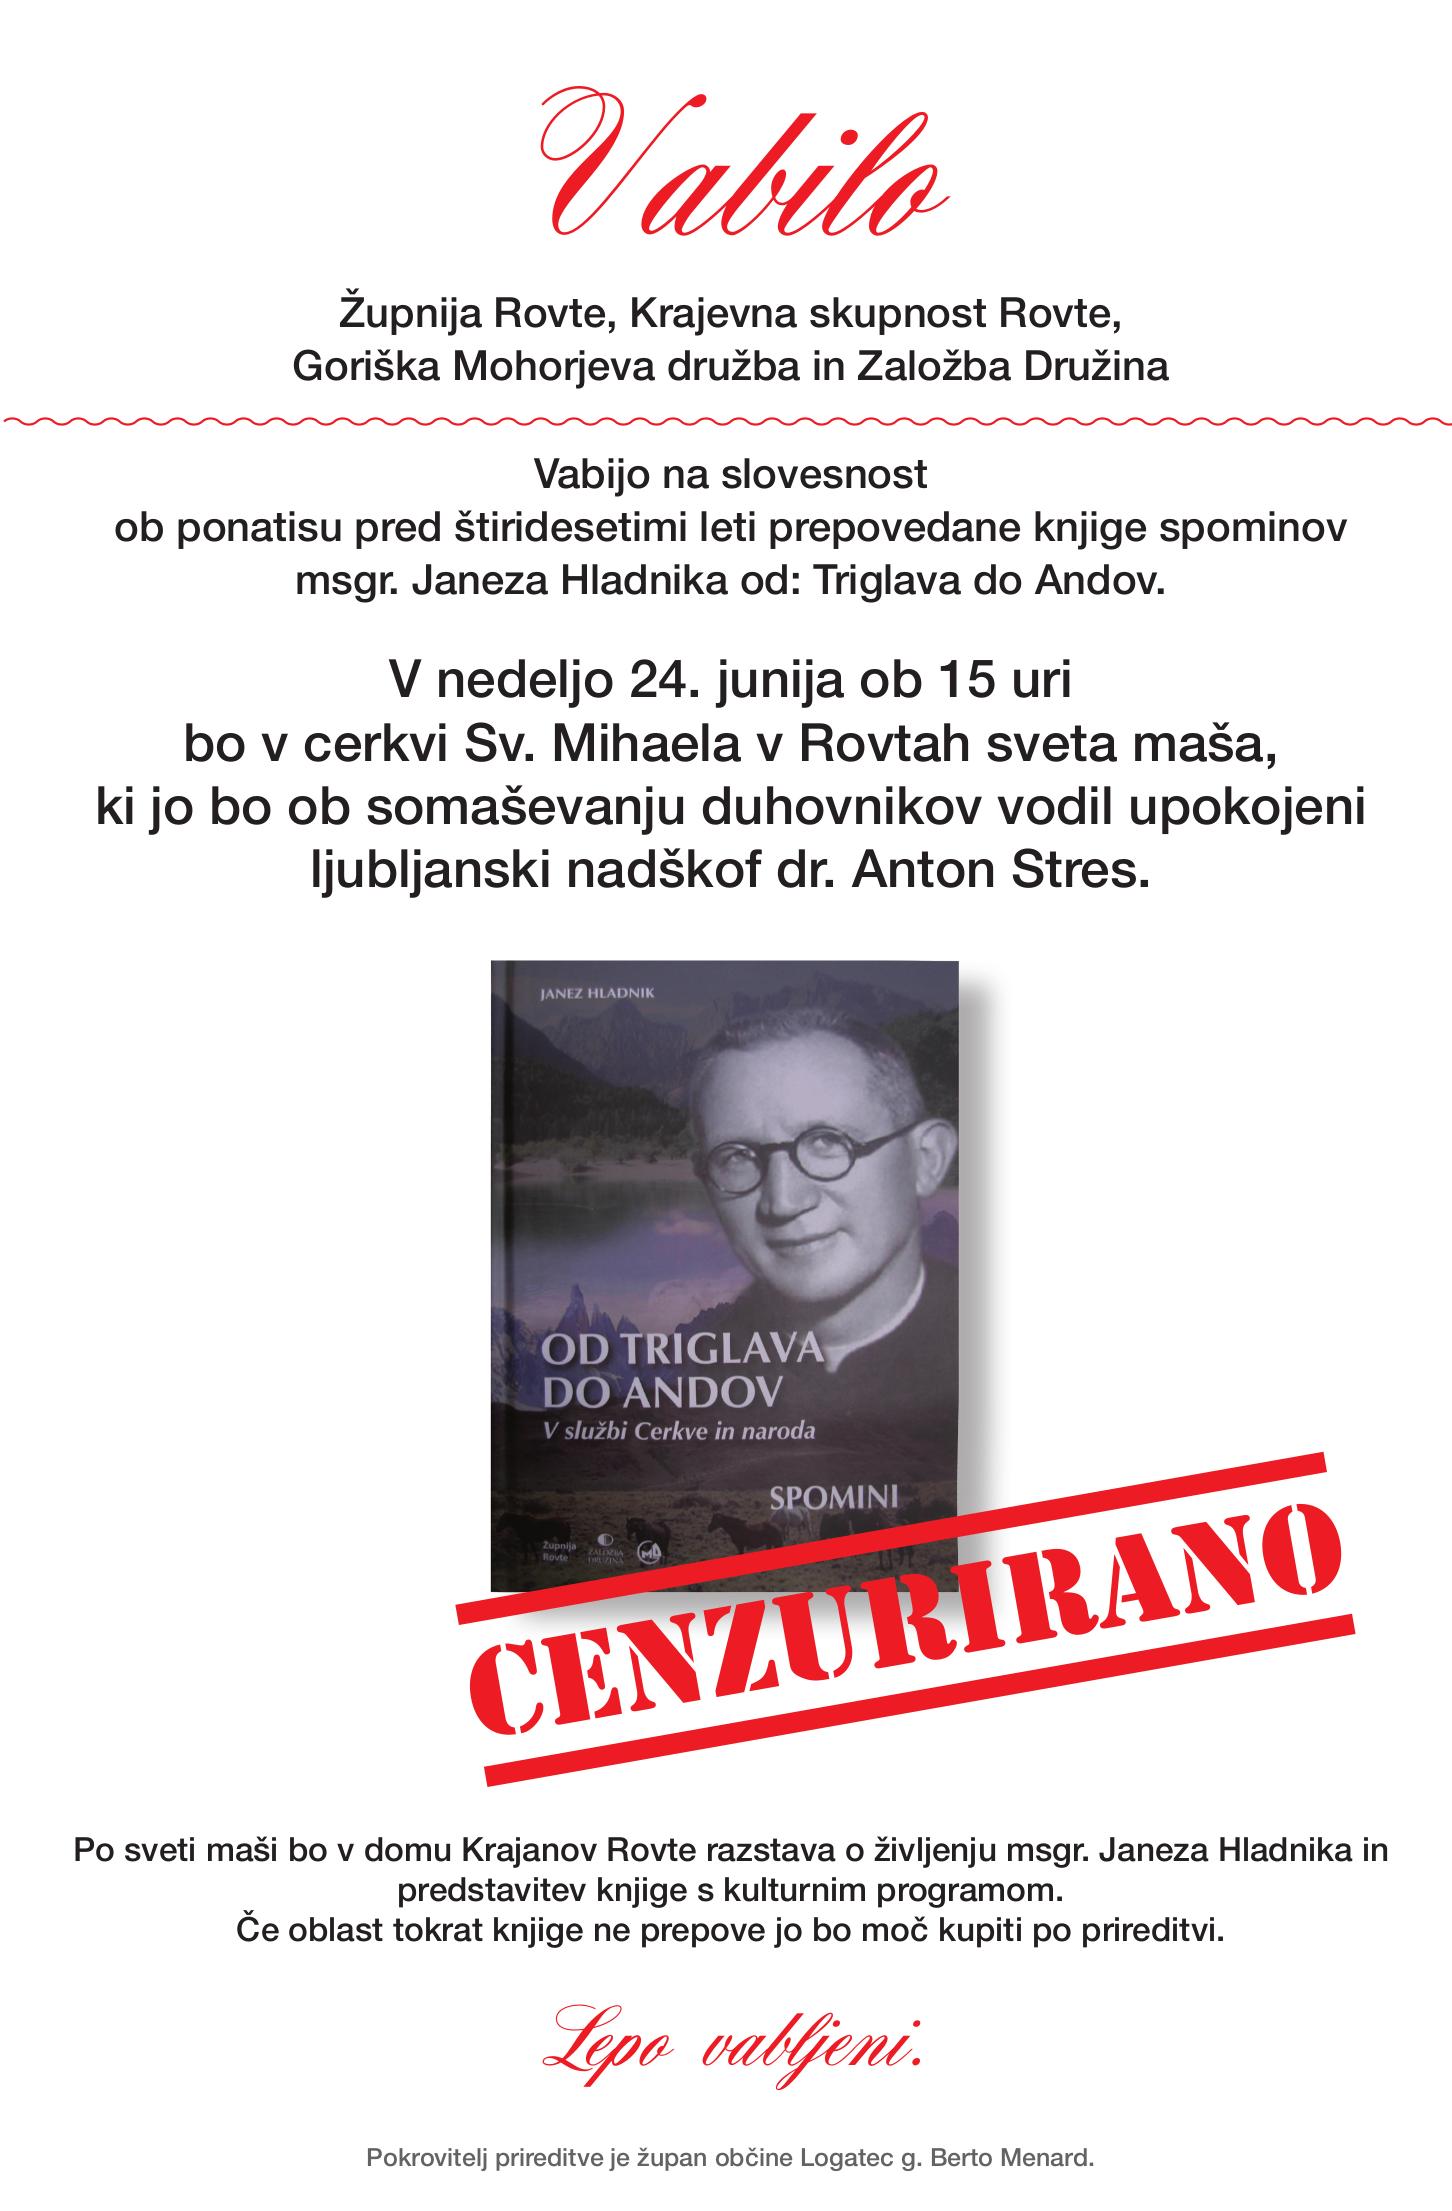 Slovesmnost ob izidu knjige Od Triglava do Andov, msgr. Janez Hladnik